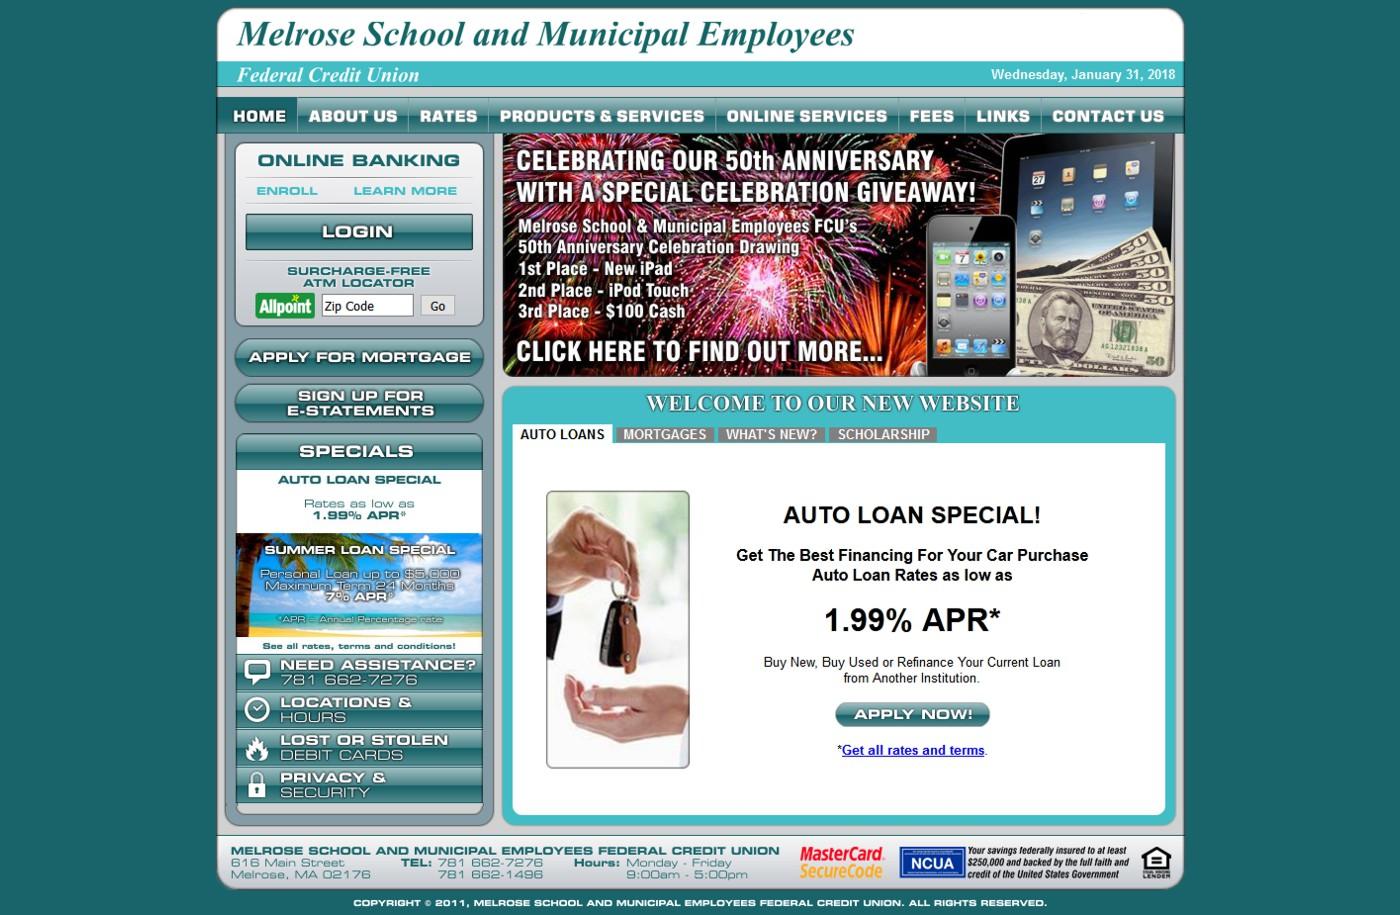 Melrose School and Municipal Employees FCU